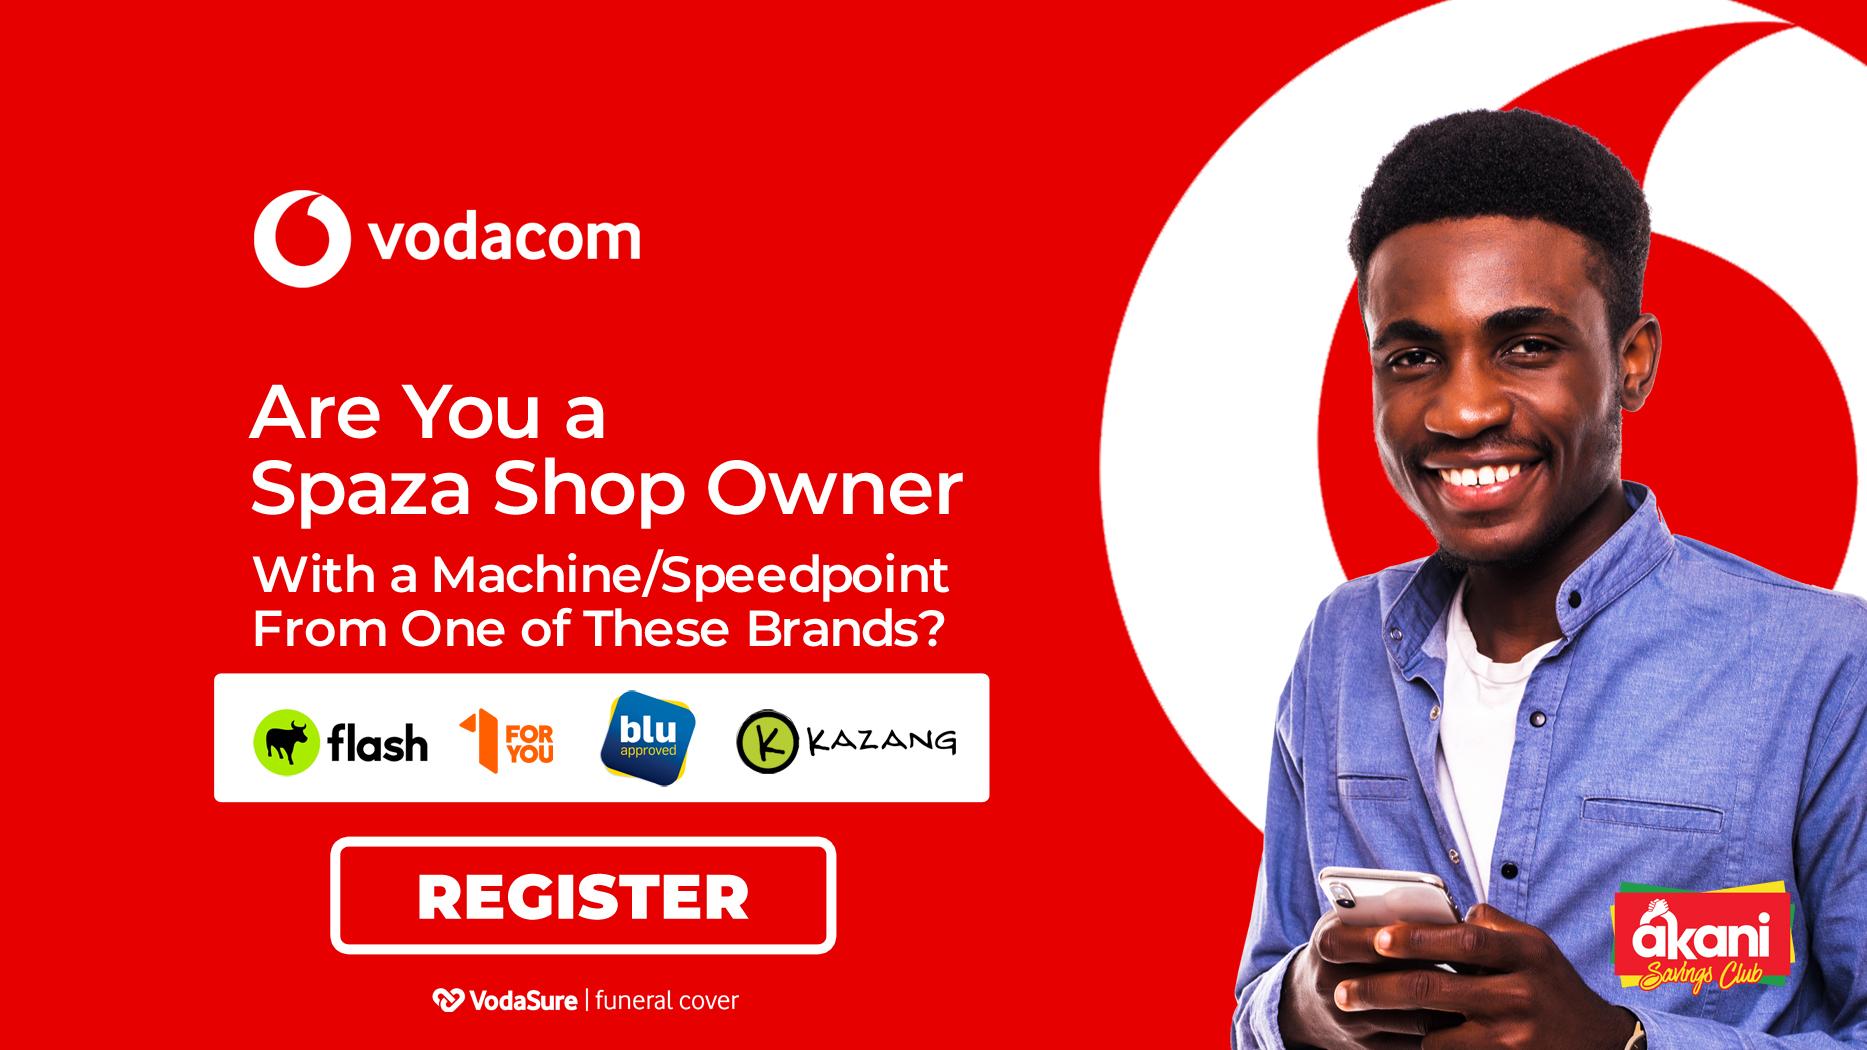 Vodacom-Akani-Spaza-Shops-21